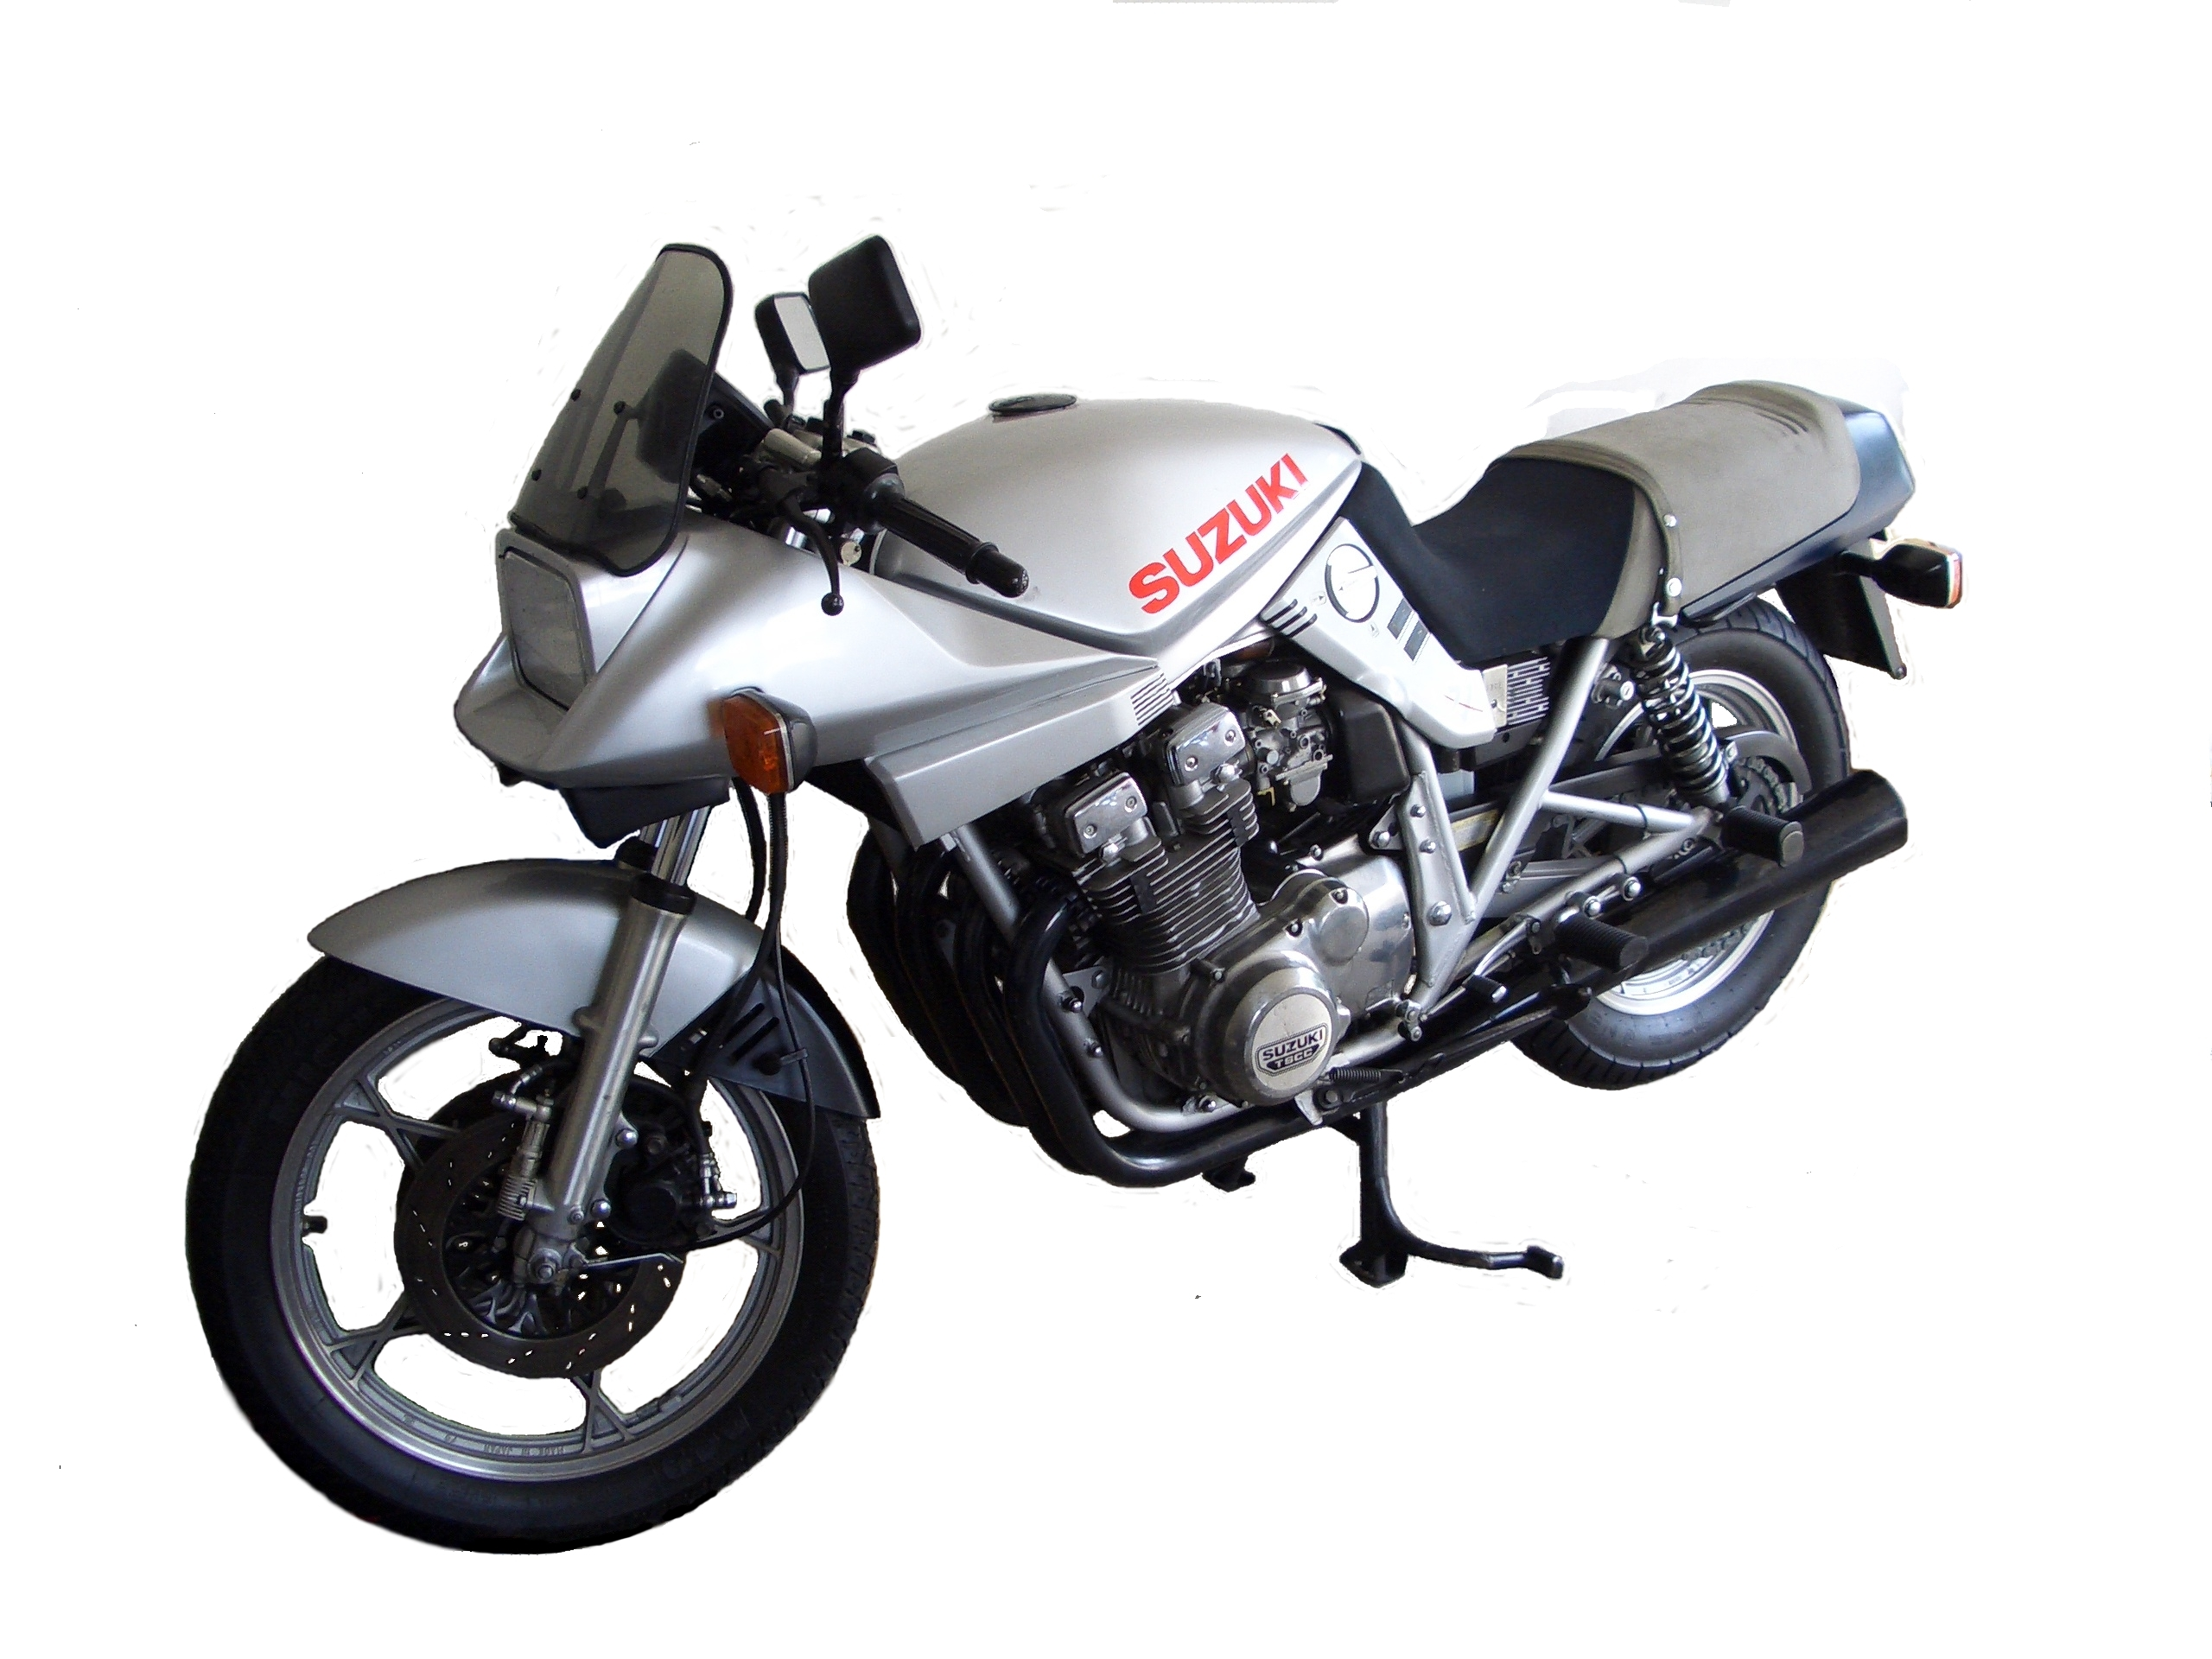 Suzuki Gsx Katana Review